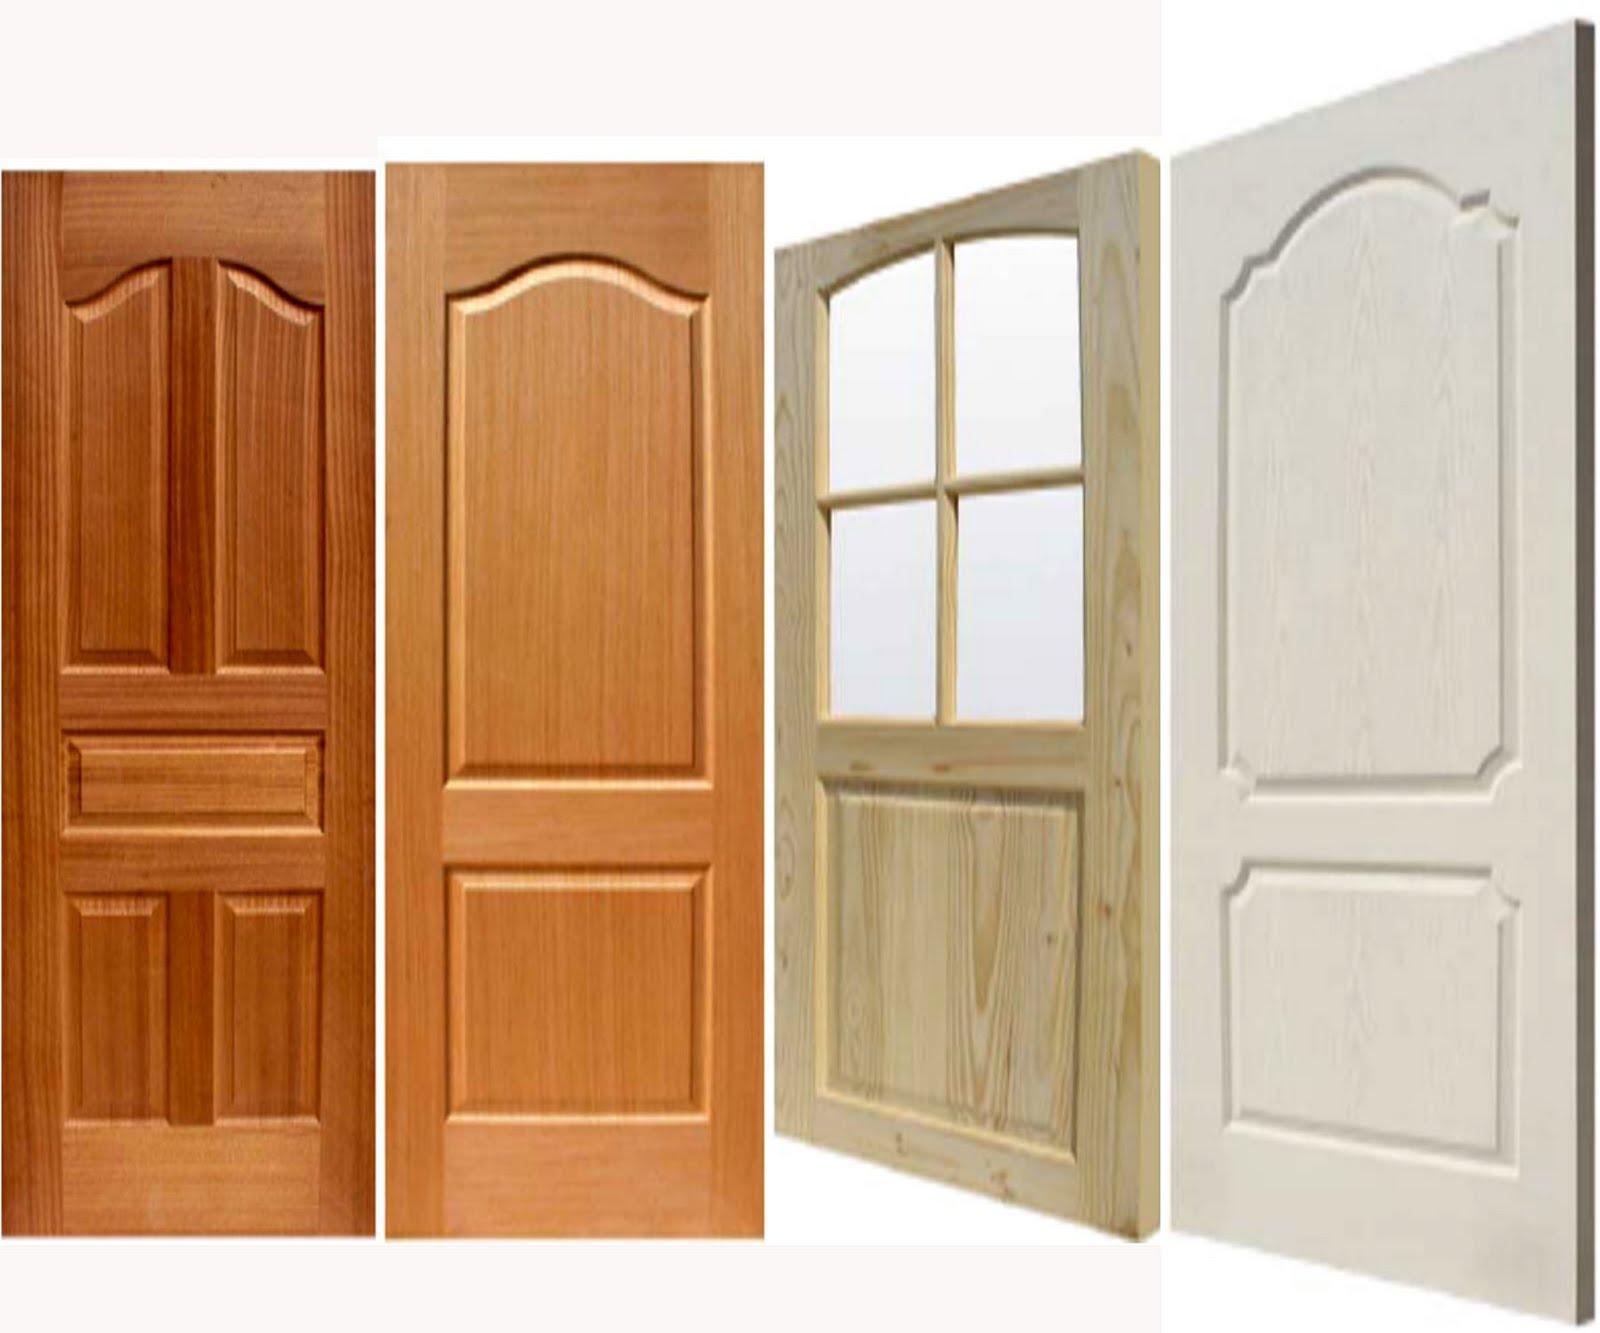 Puertas madera imagui for Imagenes de puertas de madera